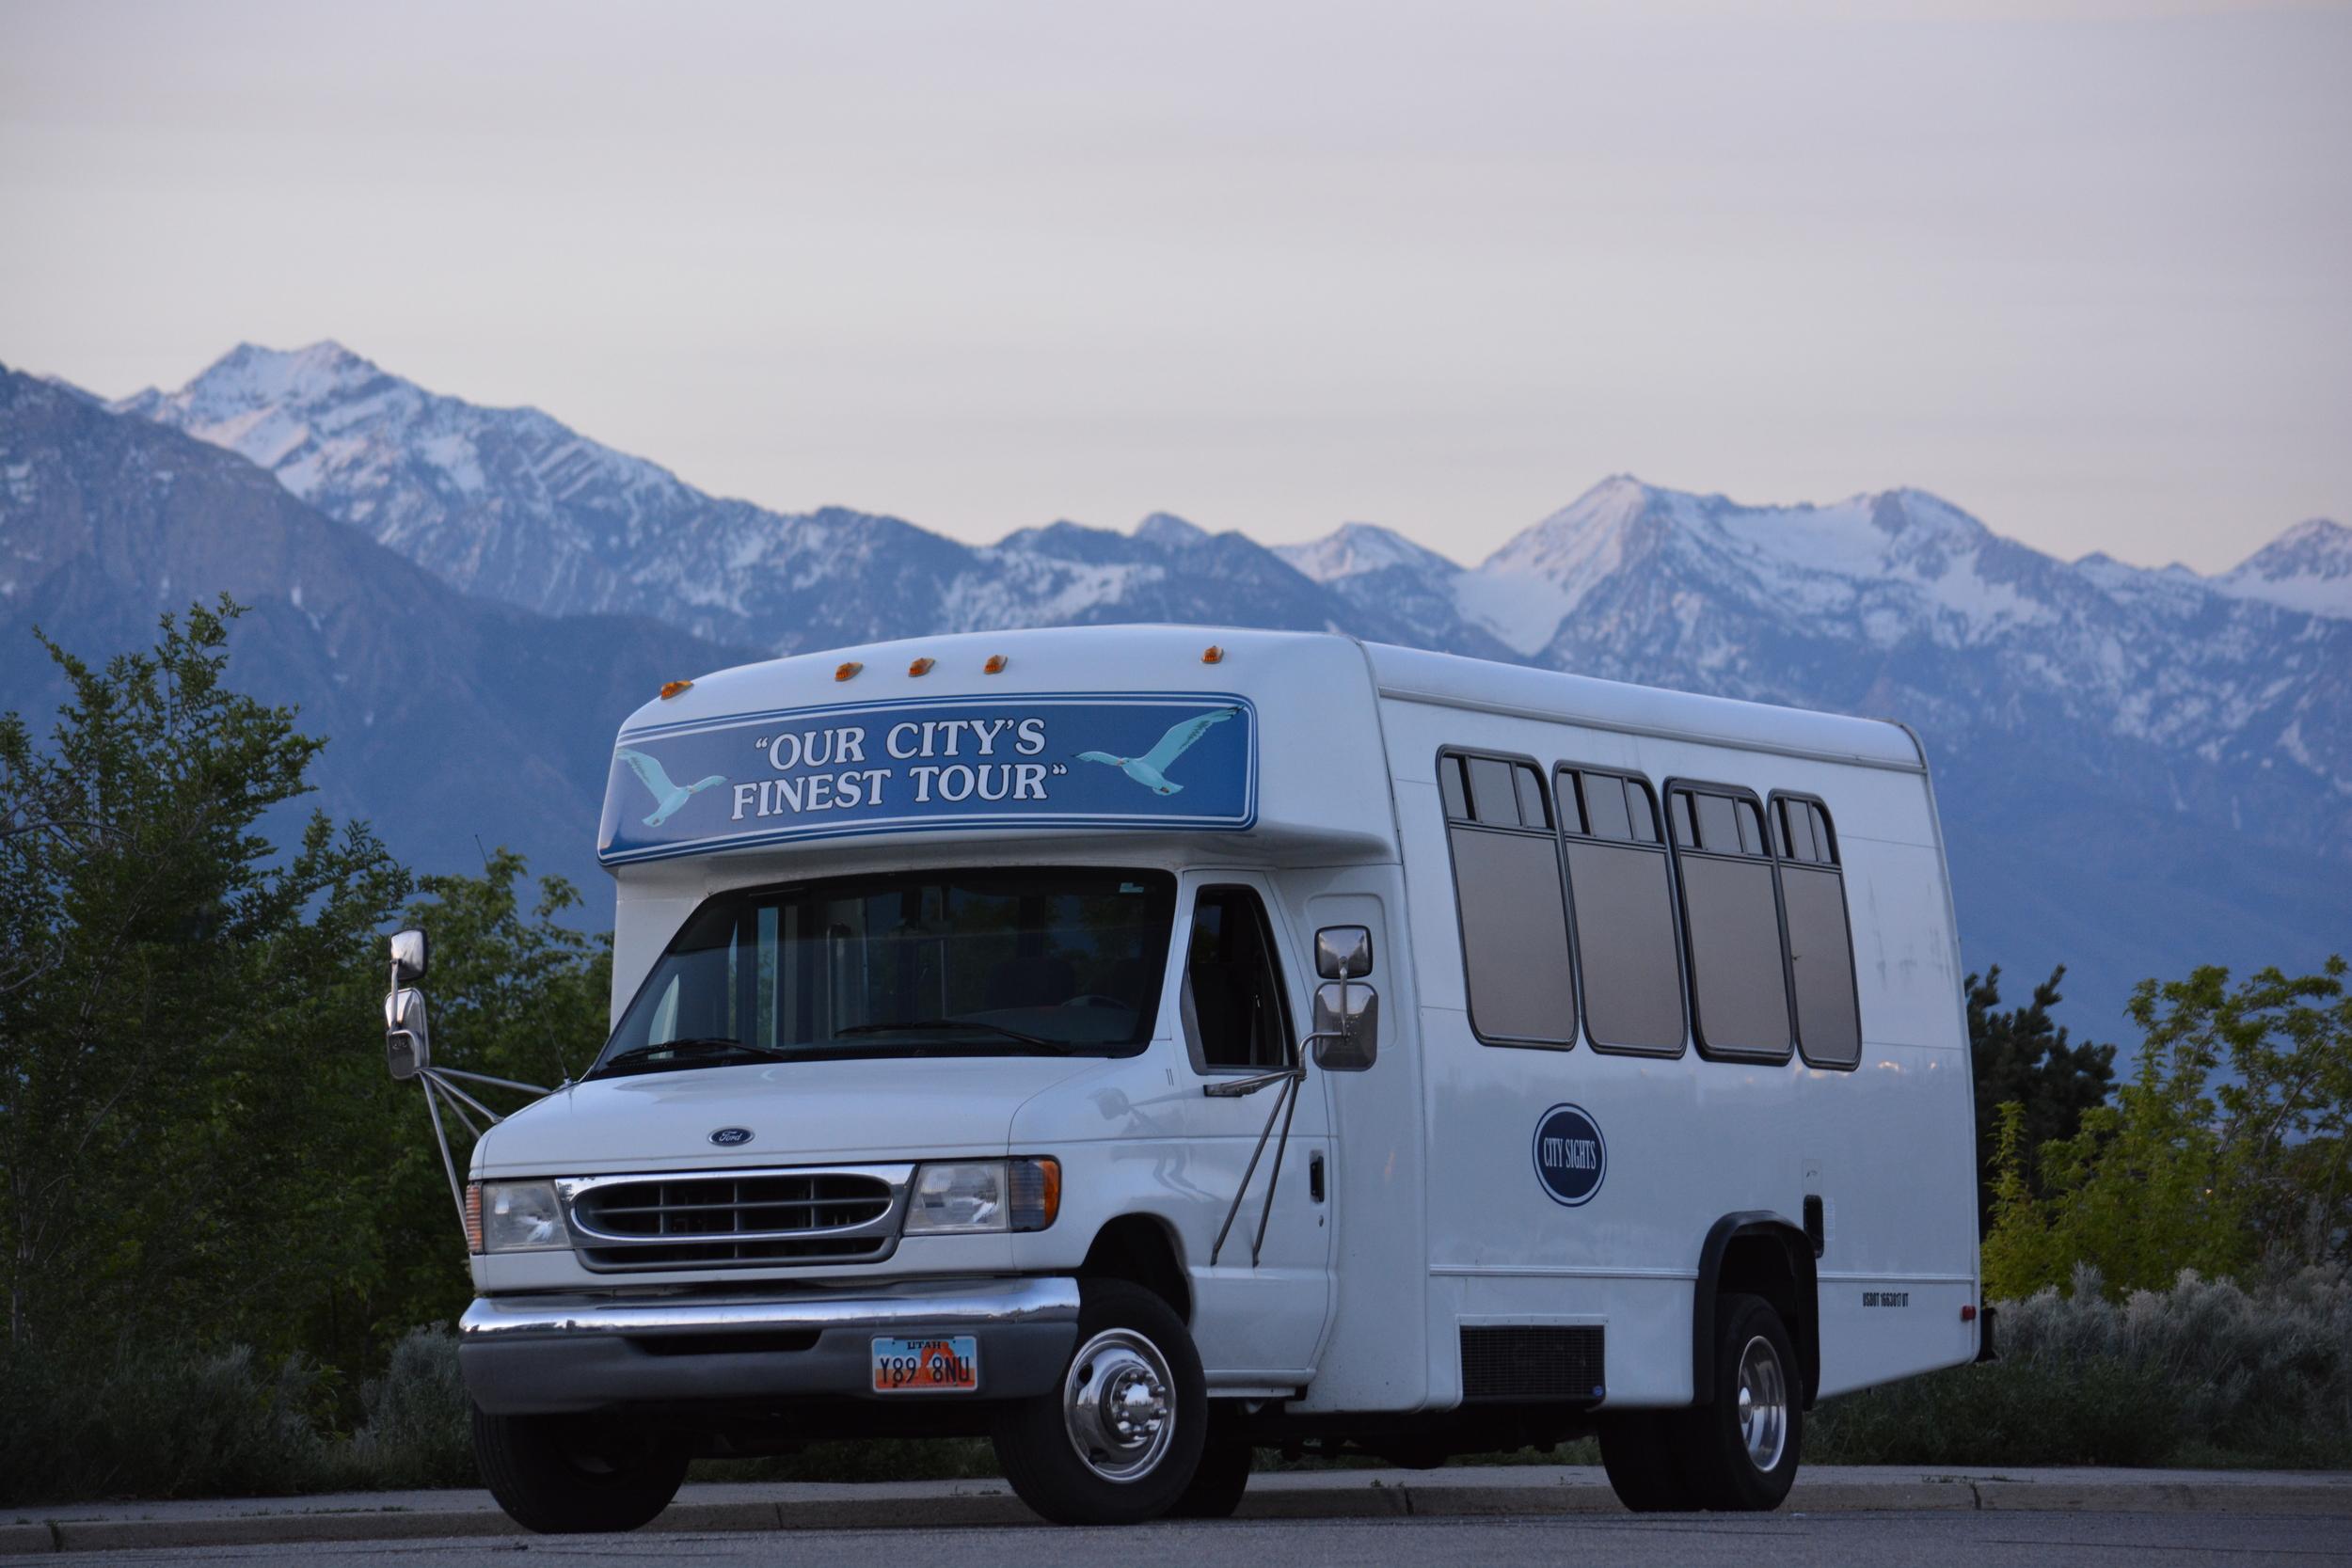 Utah tour bus salt lake city